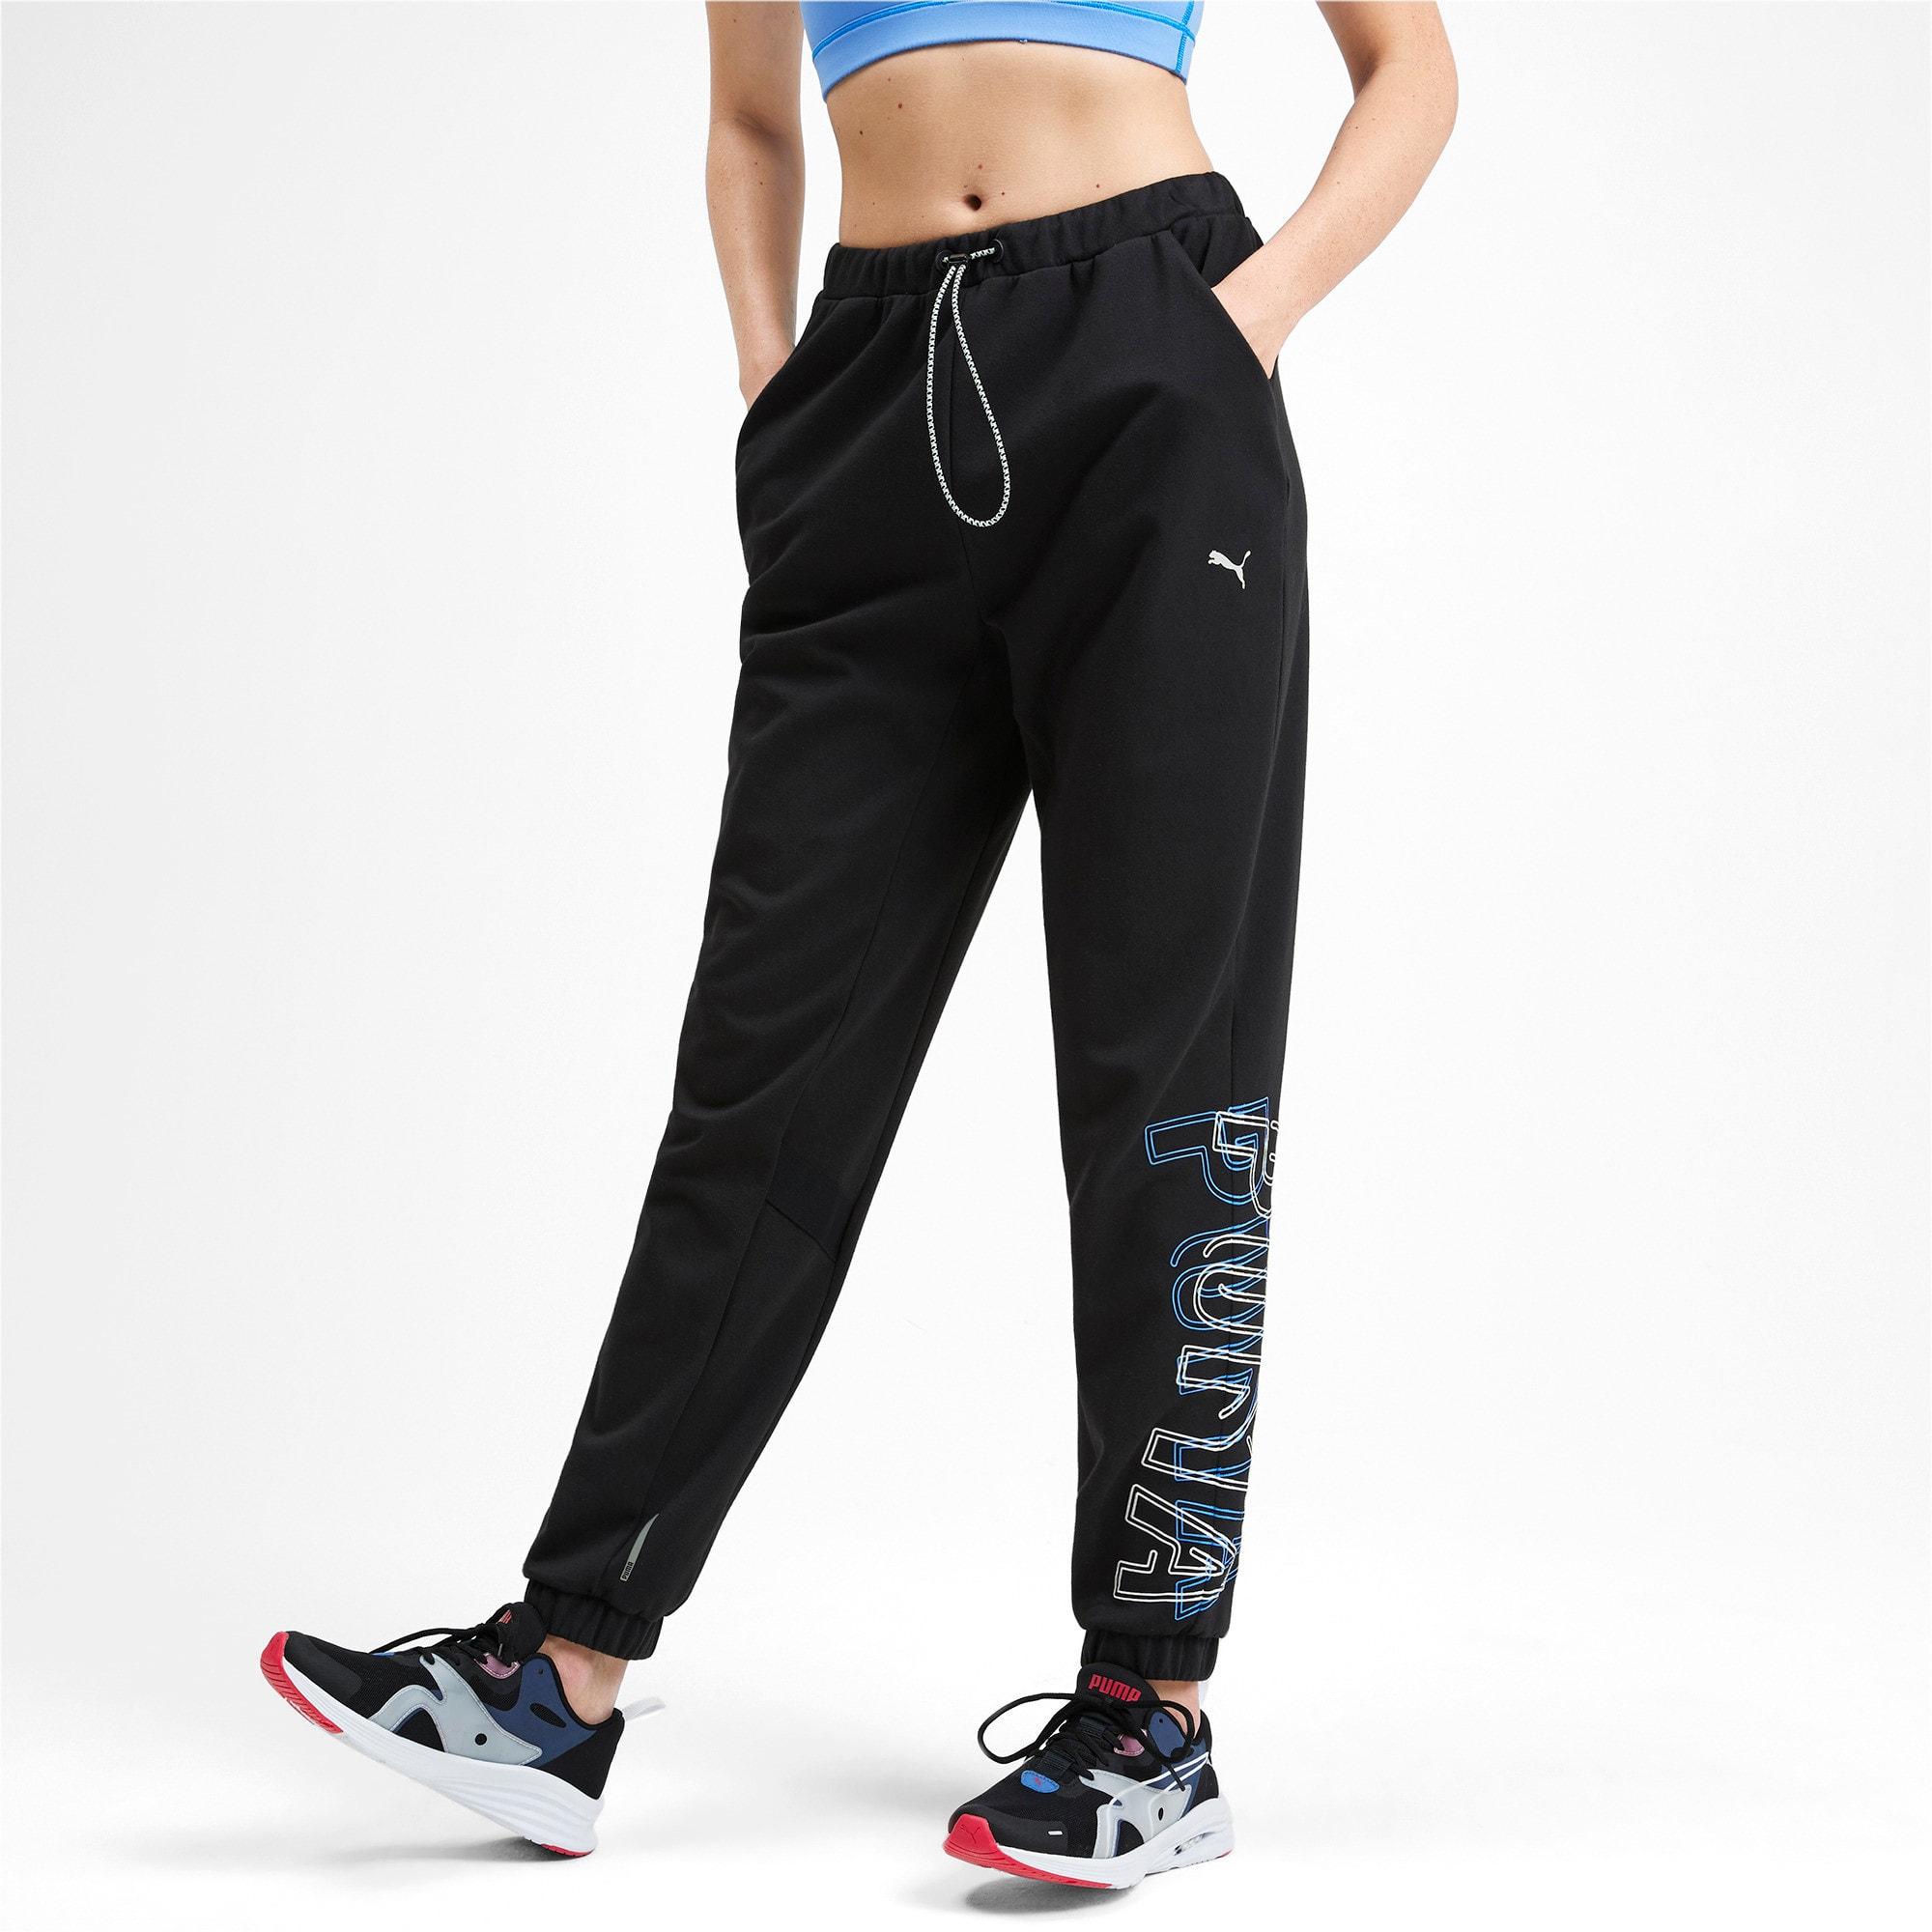 Thumbnail 1 of HIT Feel It Knitted Women's Training Sweatpants, Puma Black, medium-IND